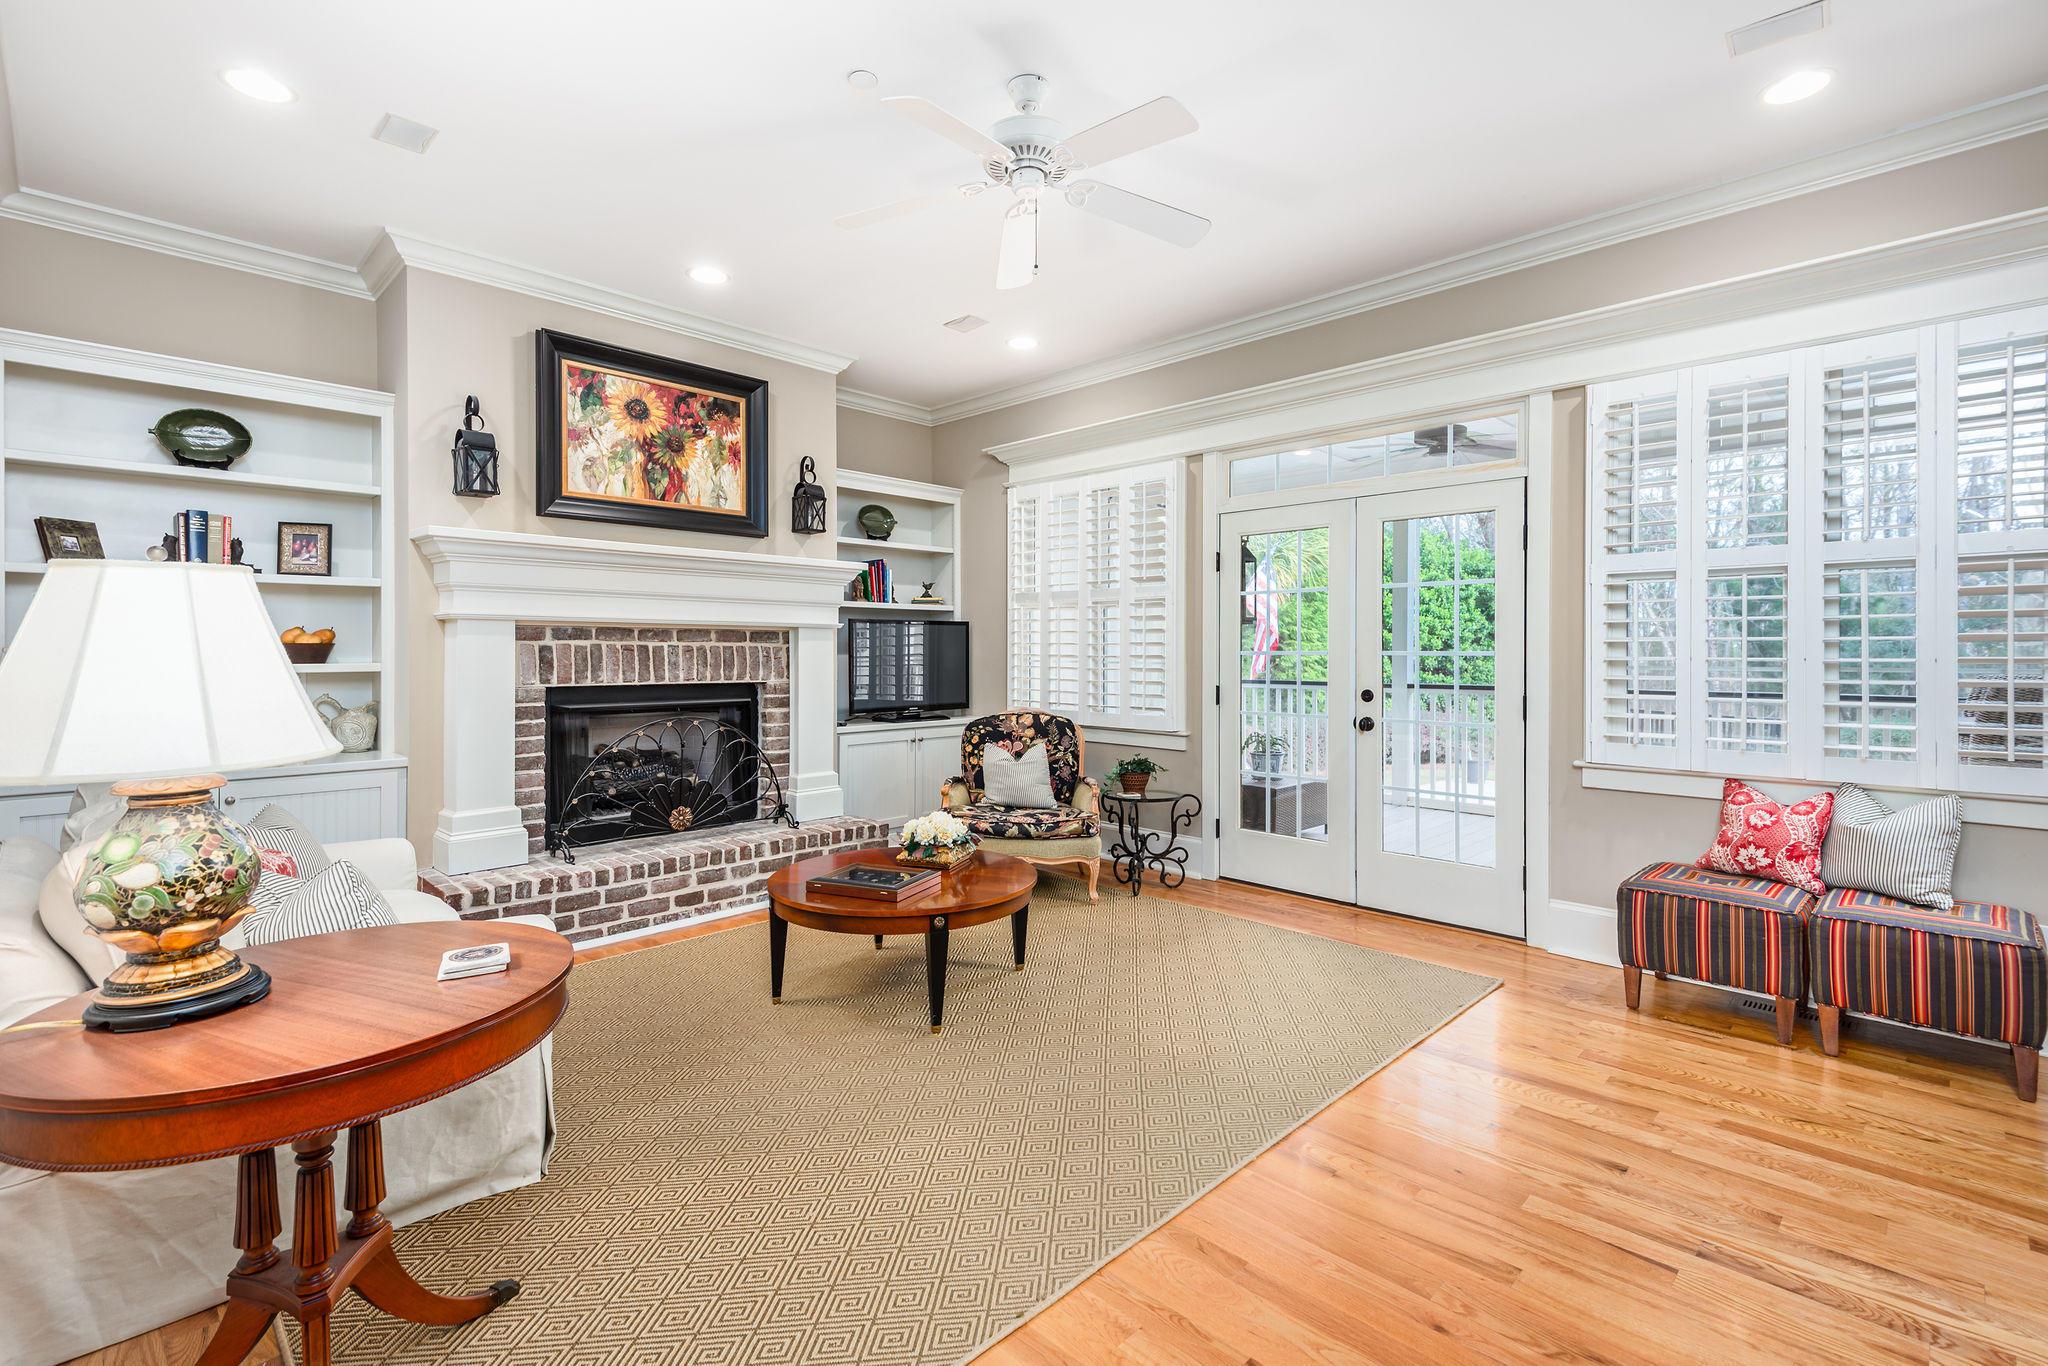 Dunes West Homes For Sale - 1305 King Bird, Mount Pleasant, SC - 49